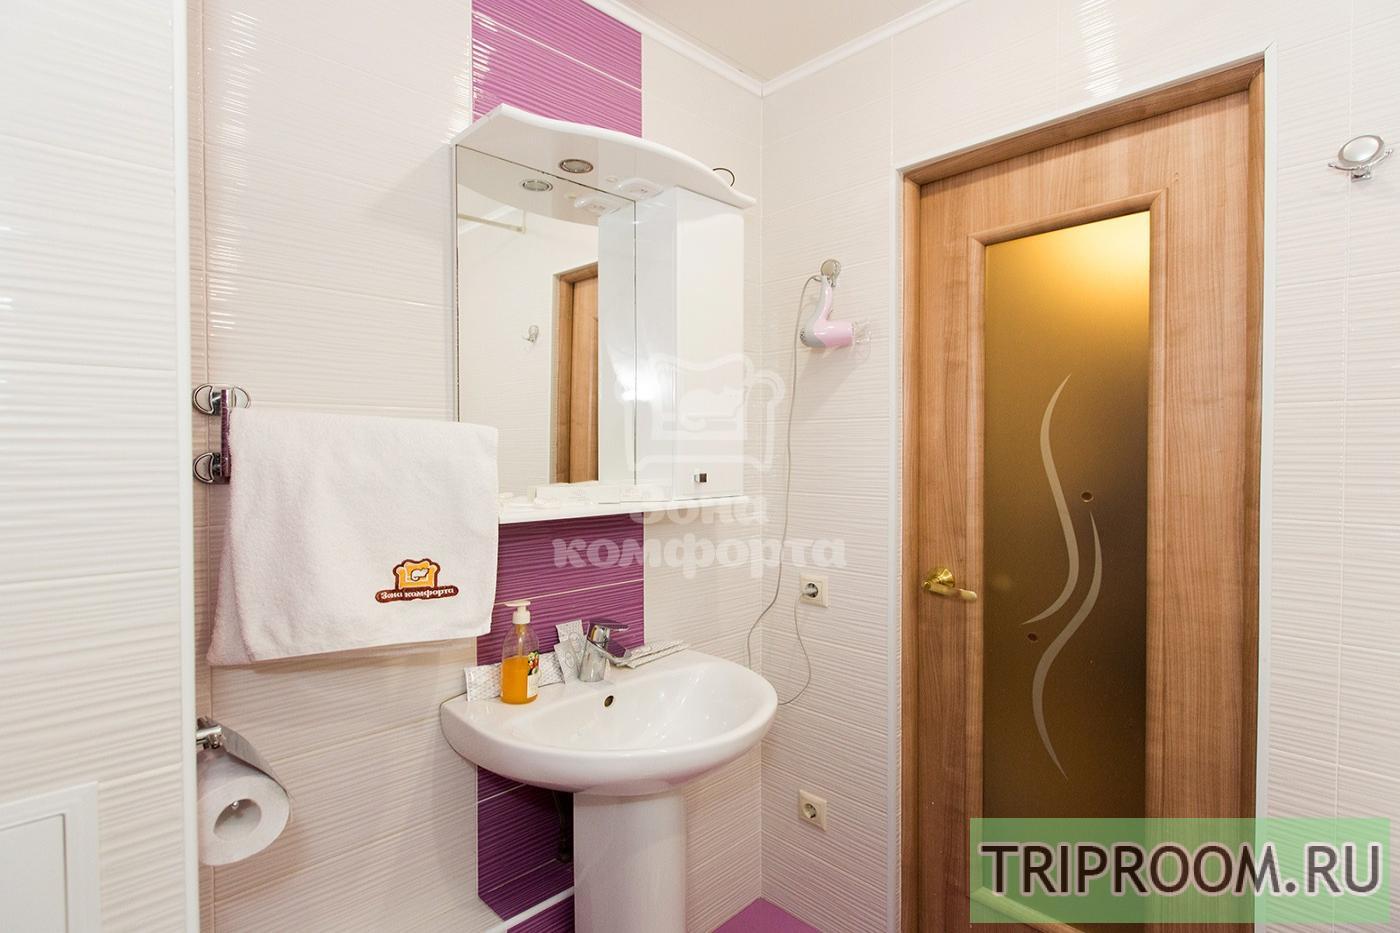 2-комнатная квартира посуточно (вариант № 34715), ул. Гагарина бульвар, фото № 2